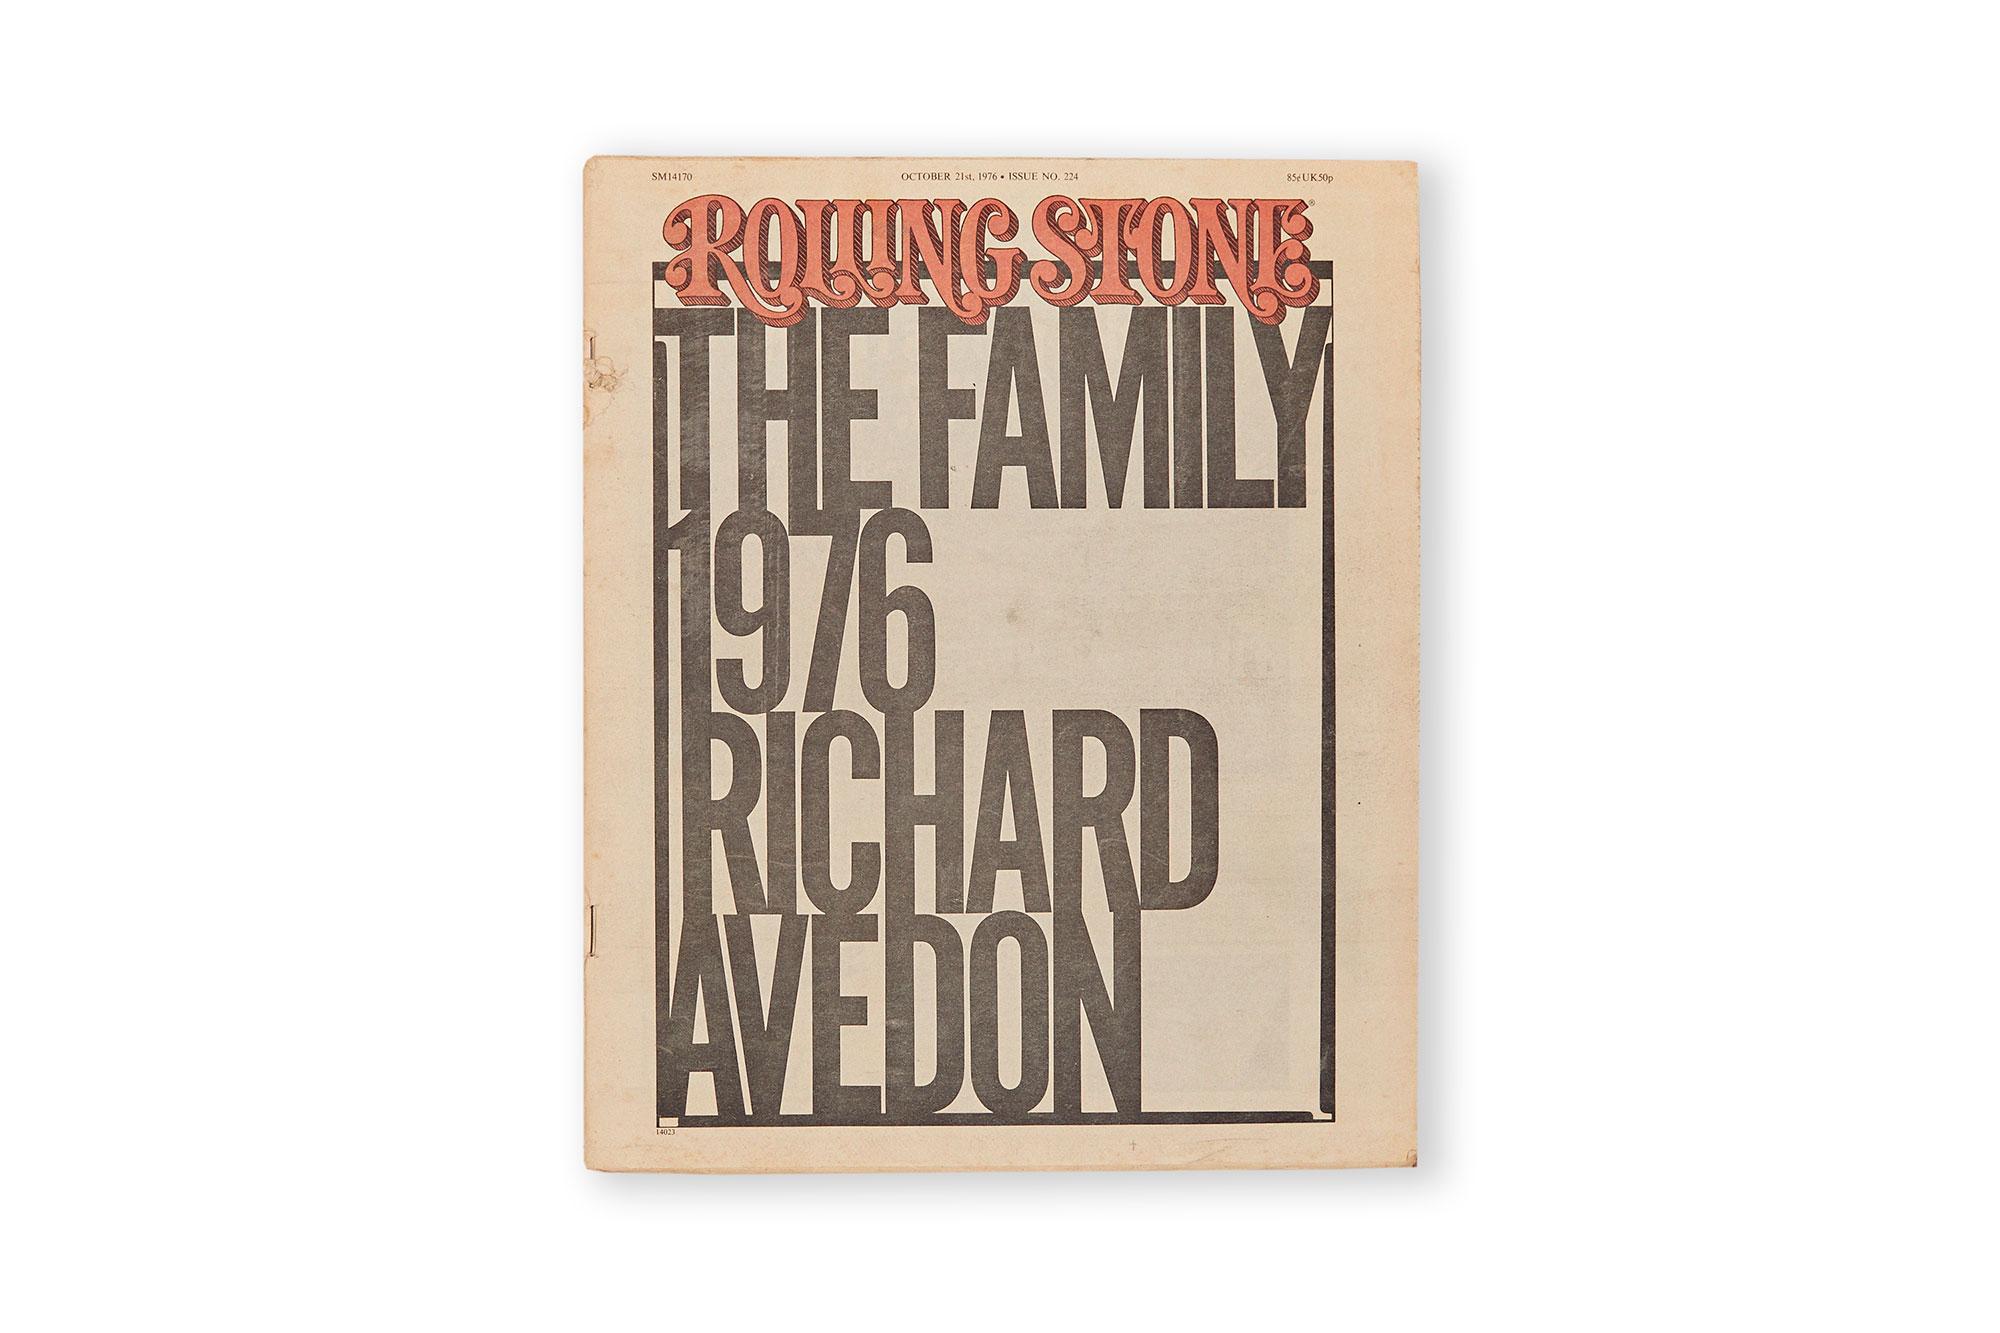 ROLLING STONE 1976, richard avedon.